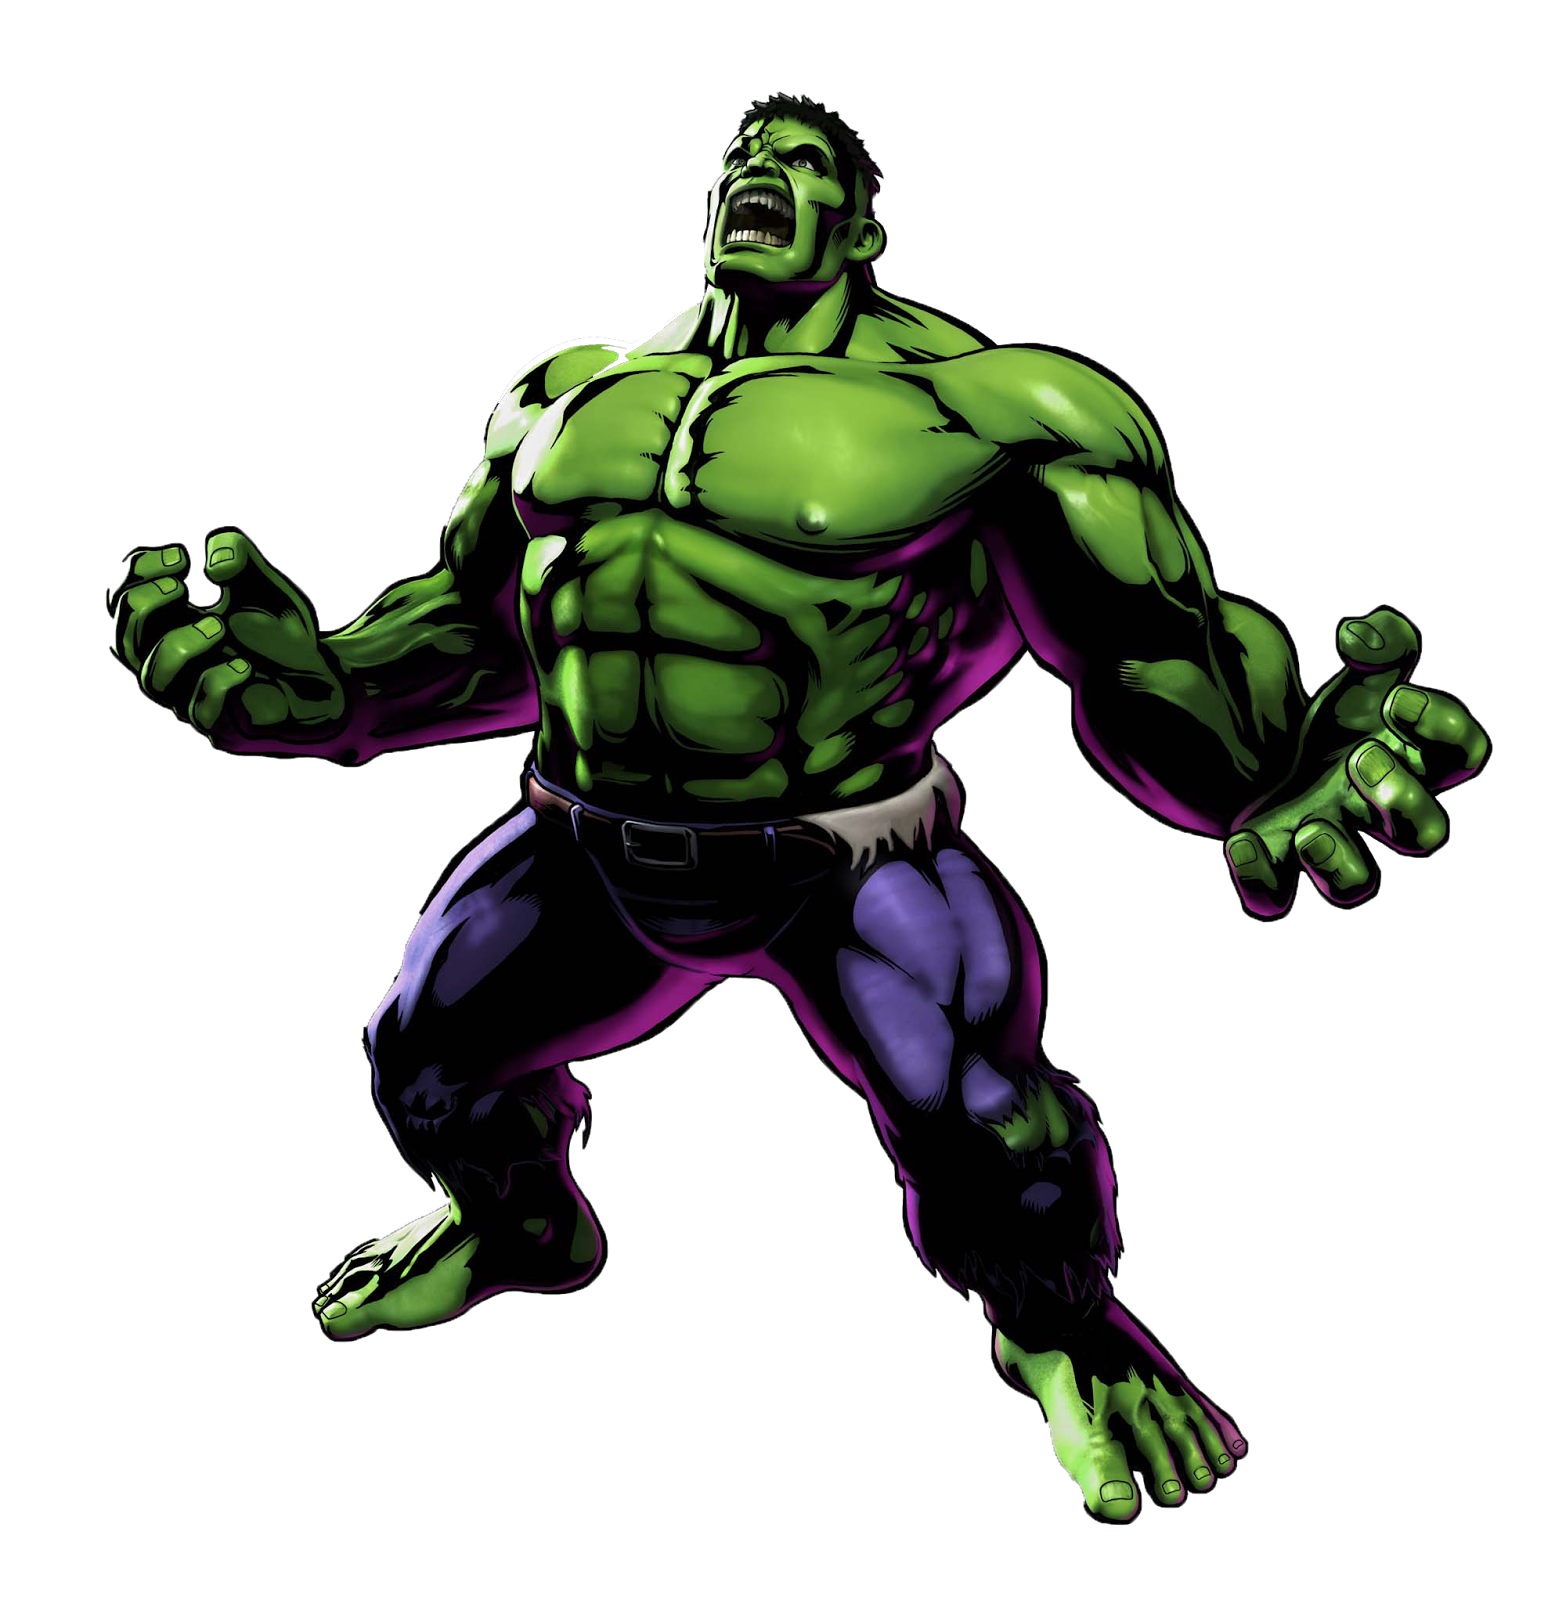 banner royalty free library Clip art wesomeness hero. Hulk clipart.